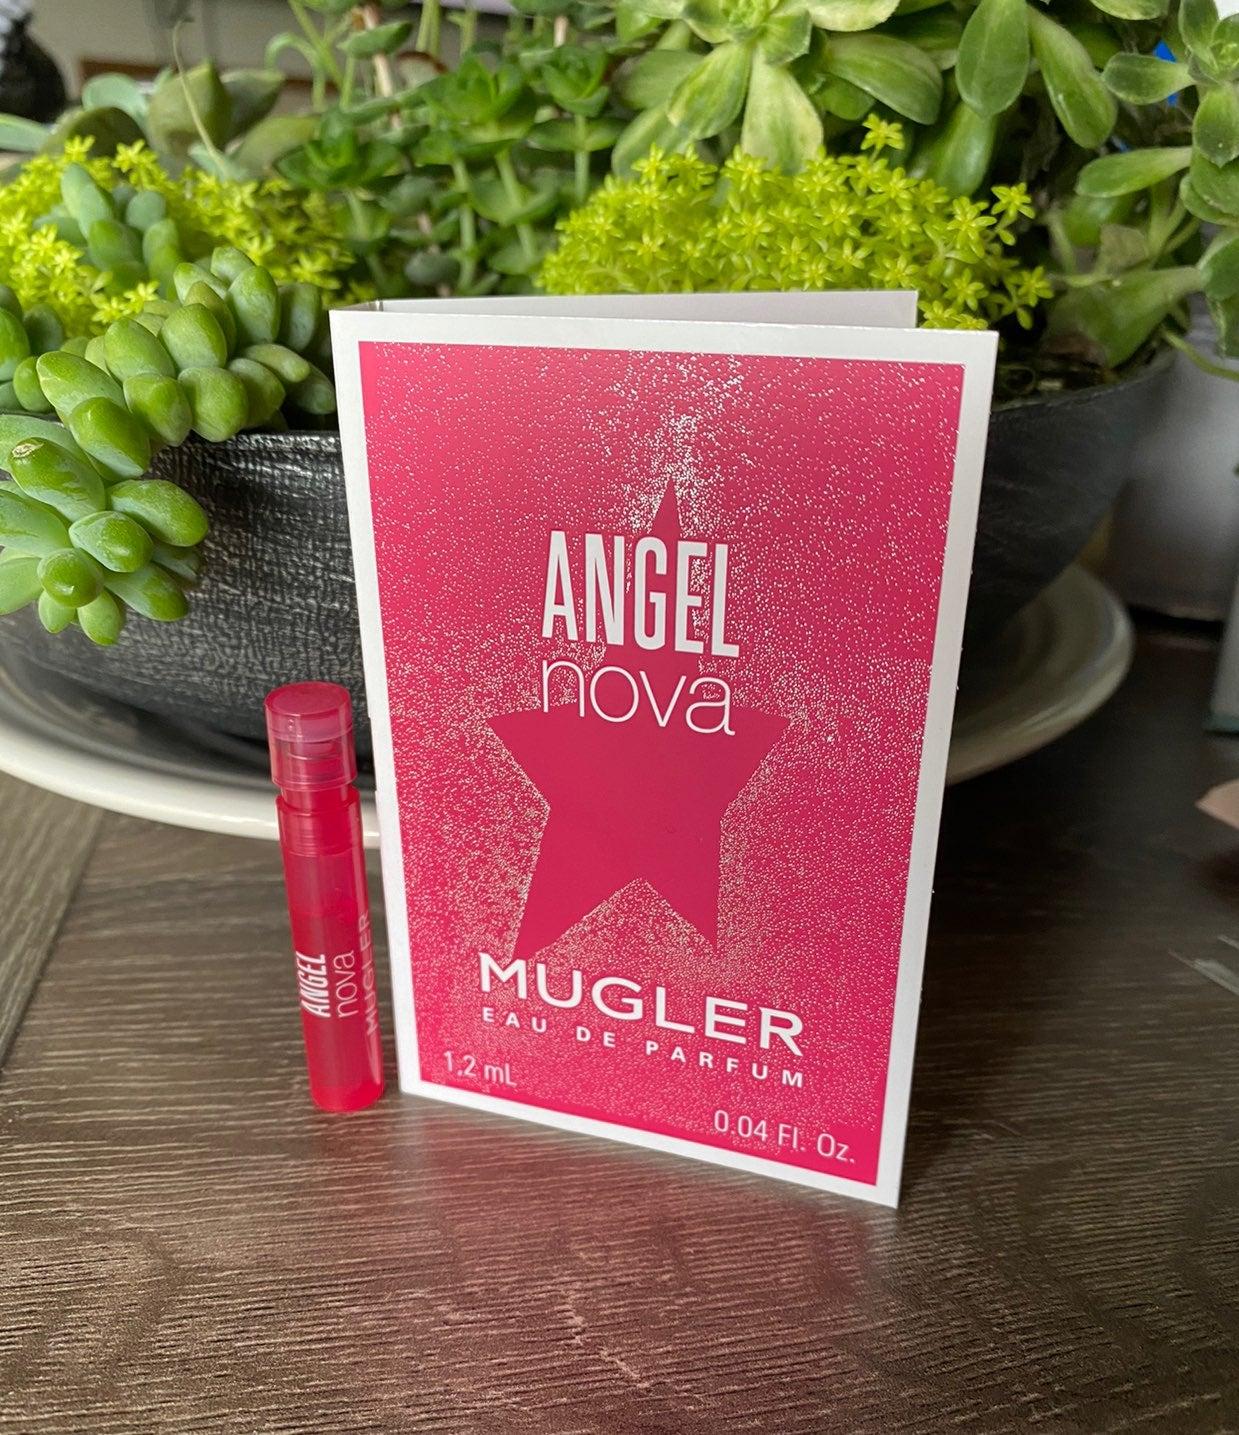 MUGLER ANGEL NOVA EDP 1.2ml SPRAY